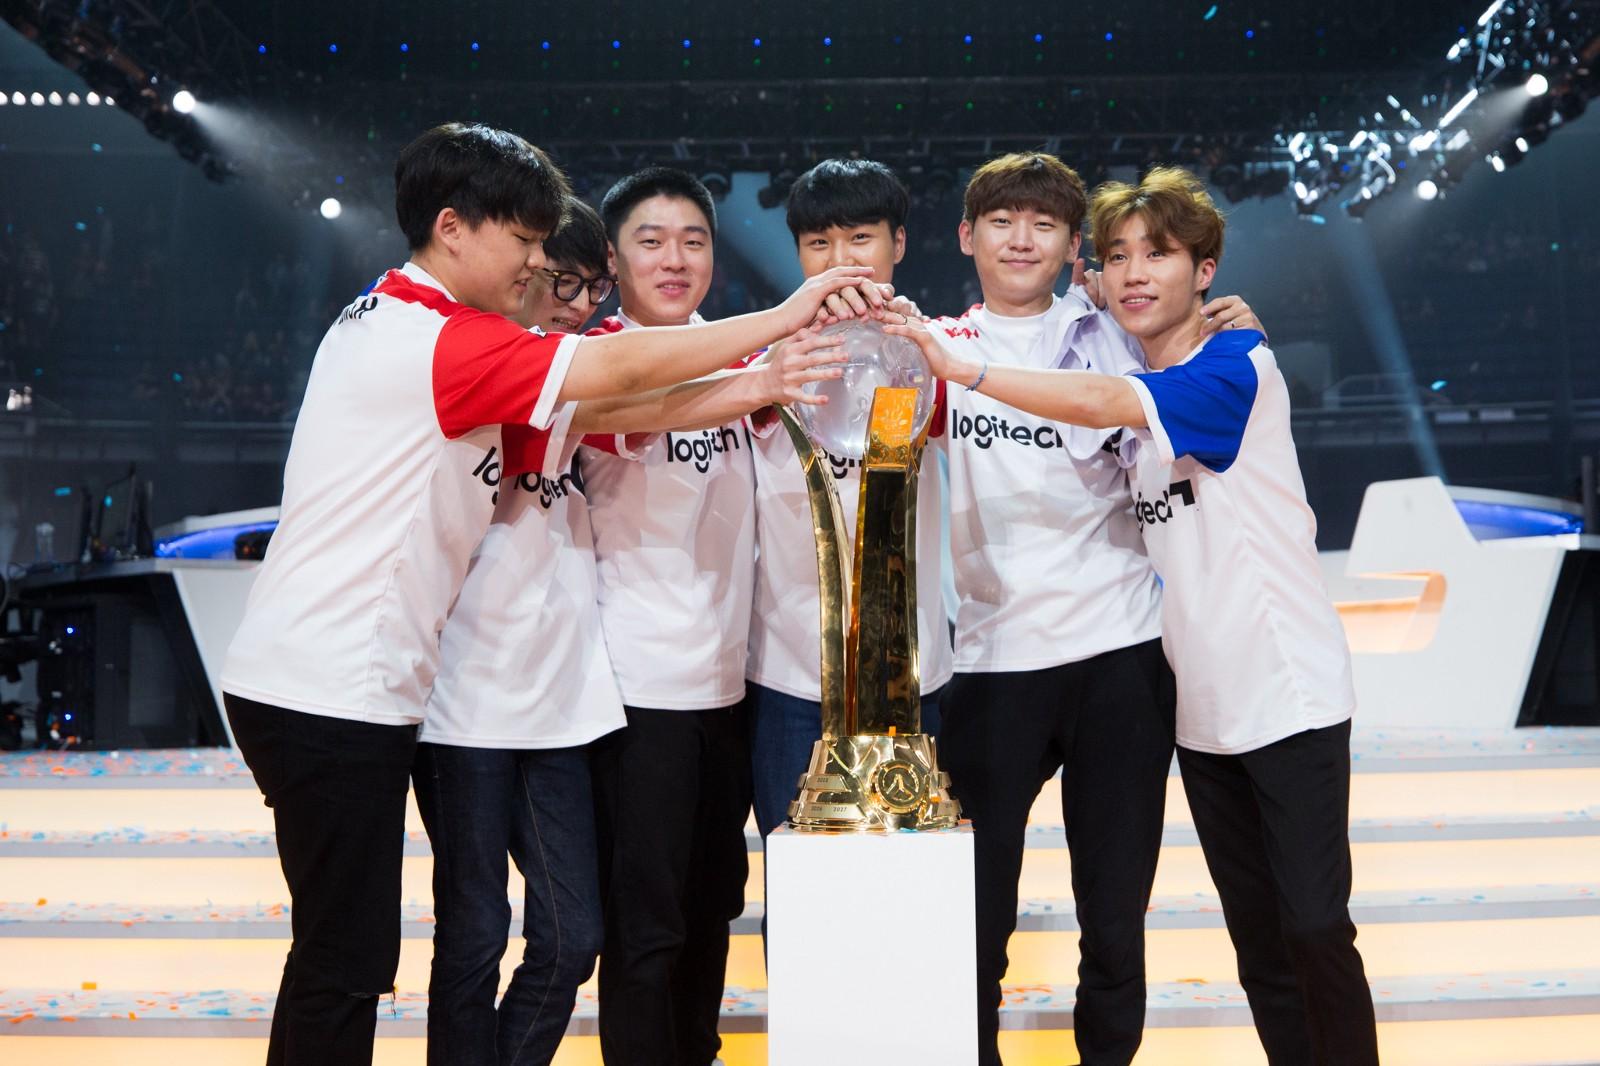 Korea #1 (Photo: Robert Paul)